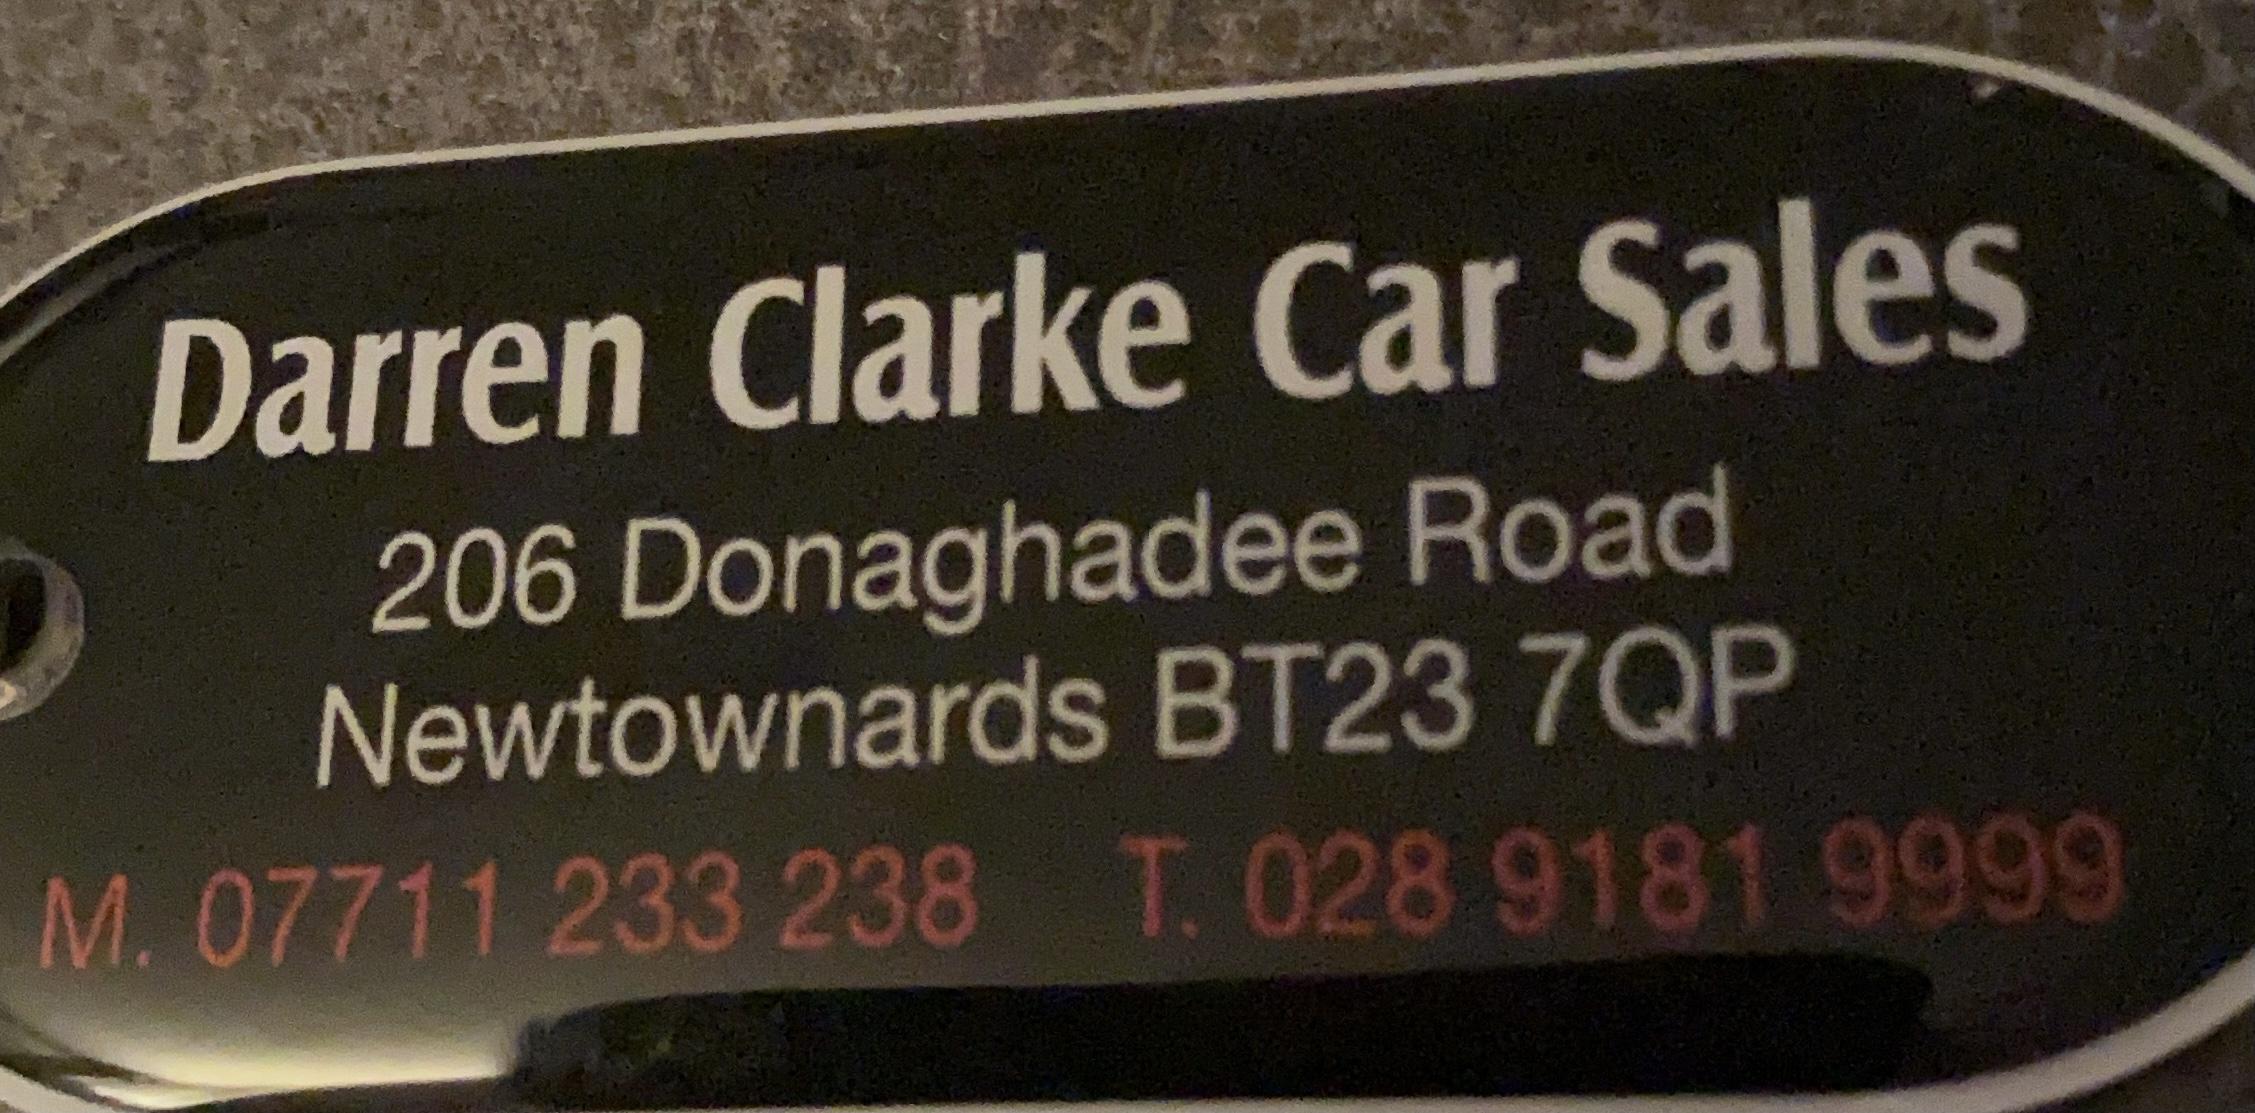 Darren Clarke Car Sales, Newtownards